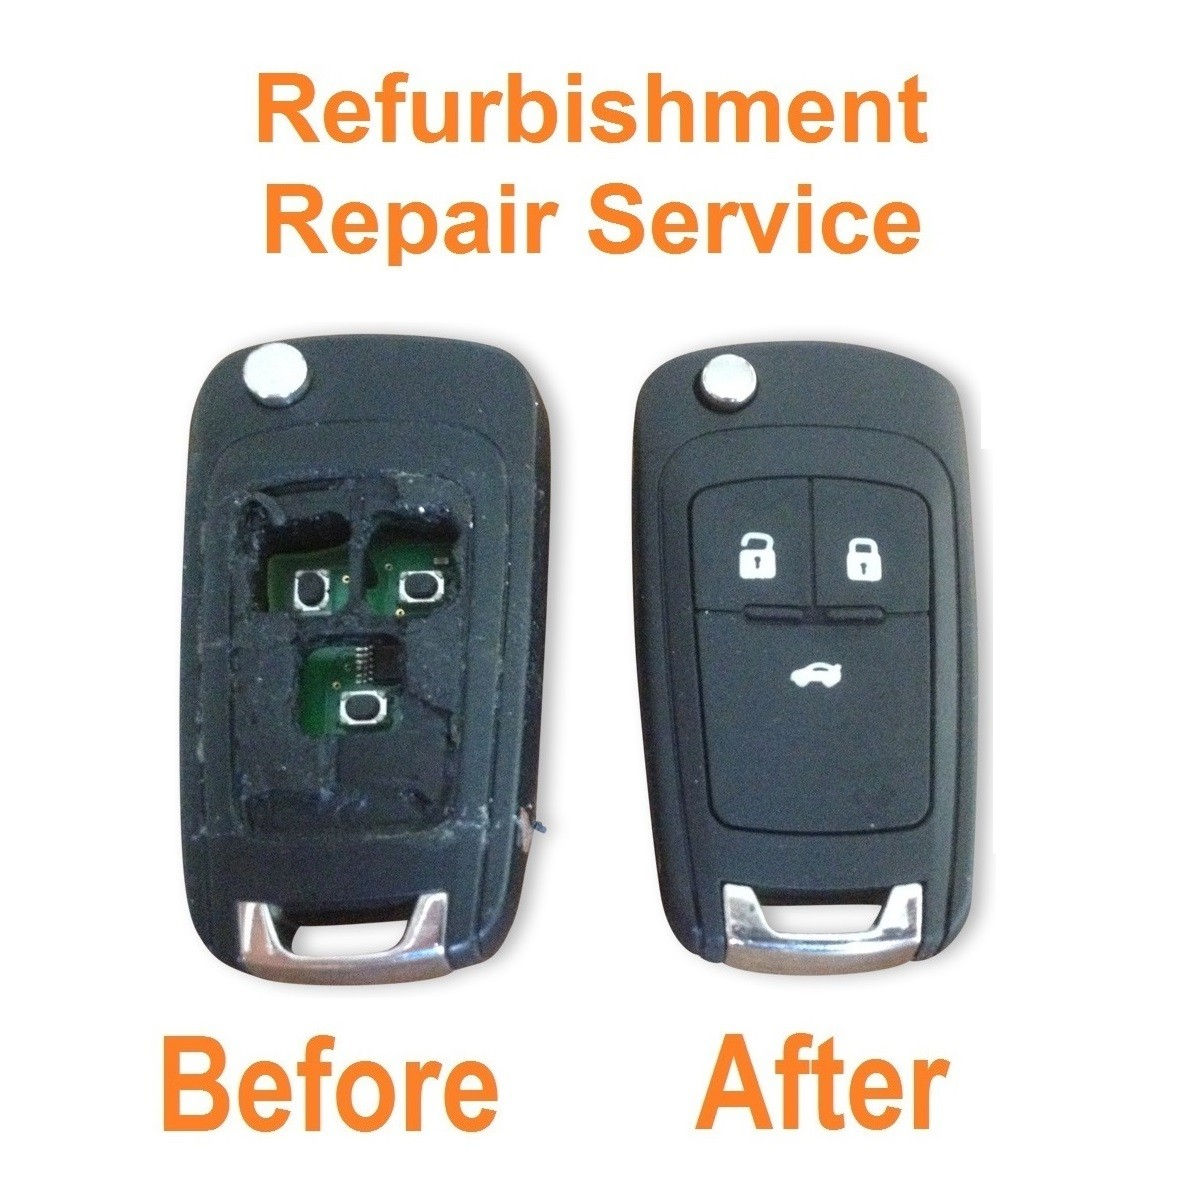 Repair refurbishment service for Vauxhall Opel Insignia Astra 3 button remote flip key